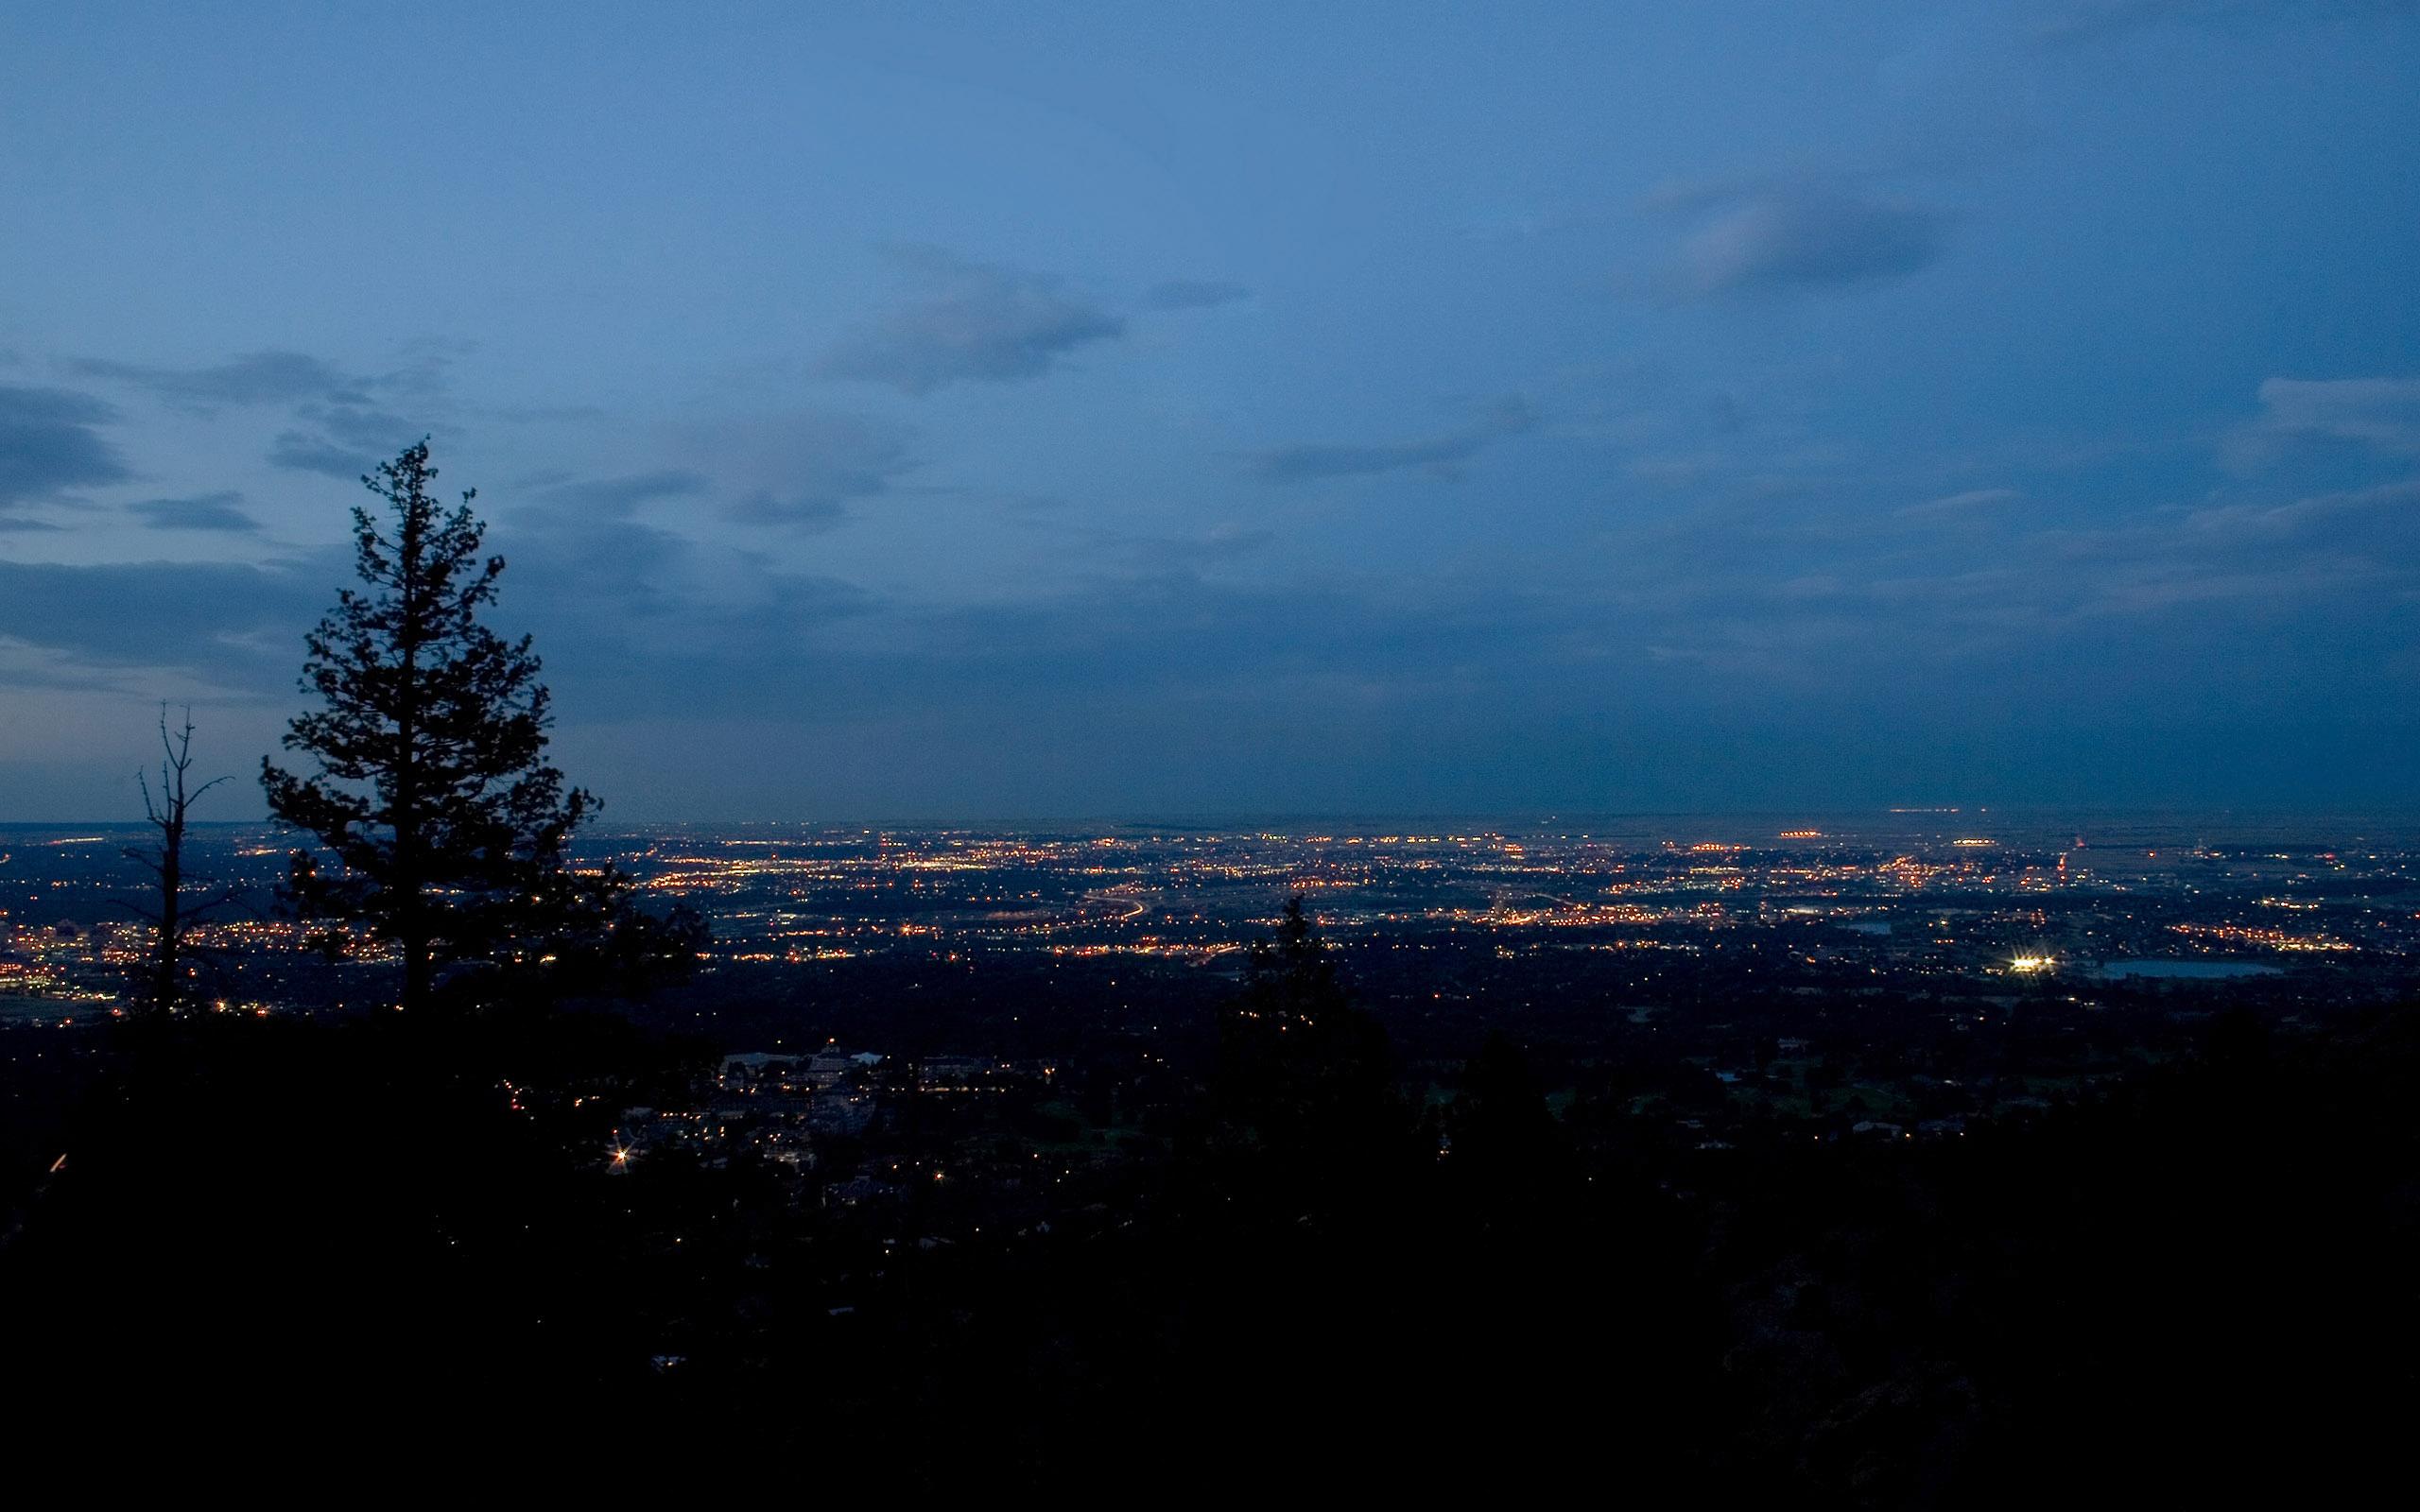 city night sky background -#main